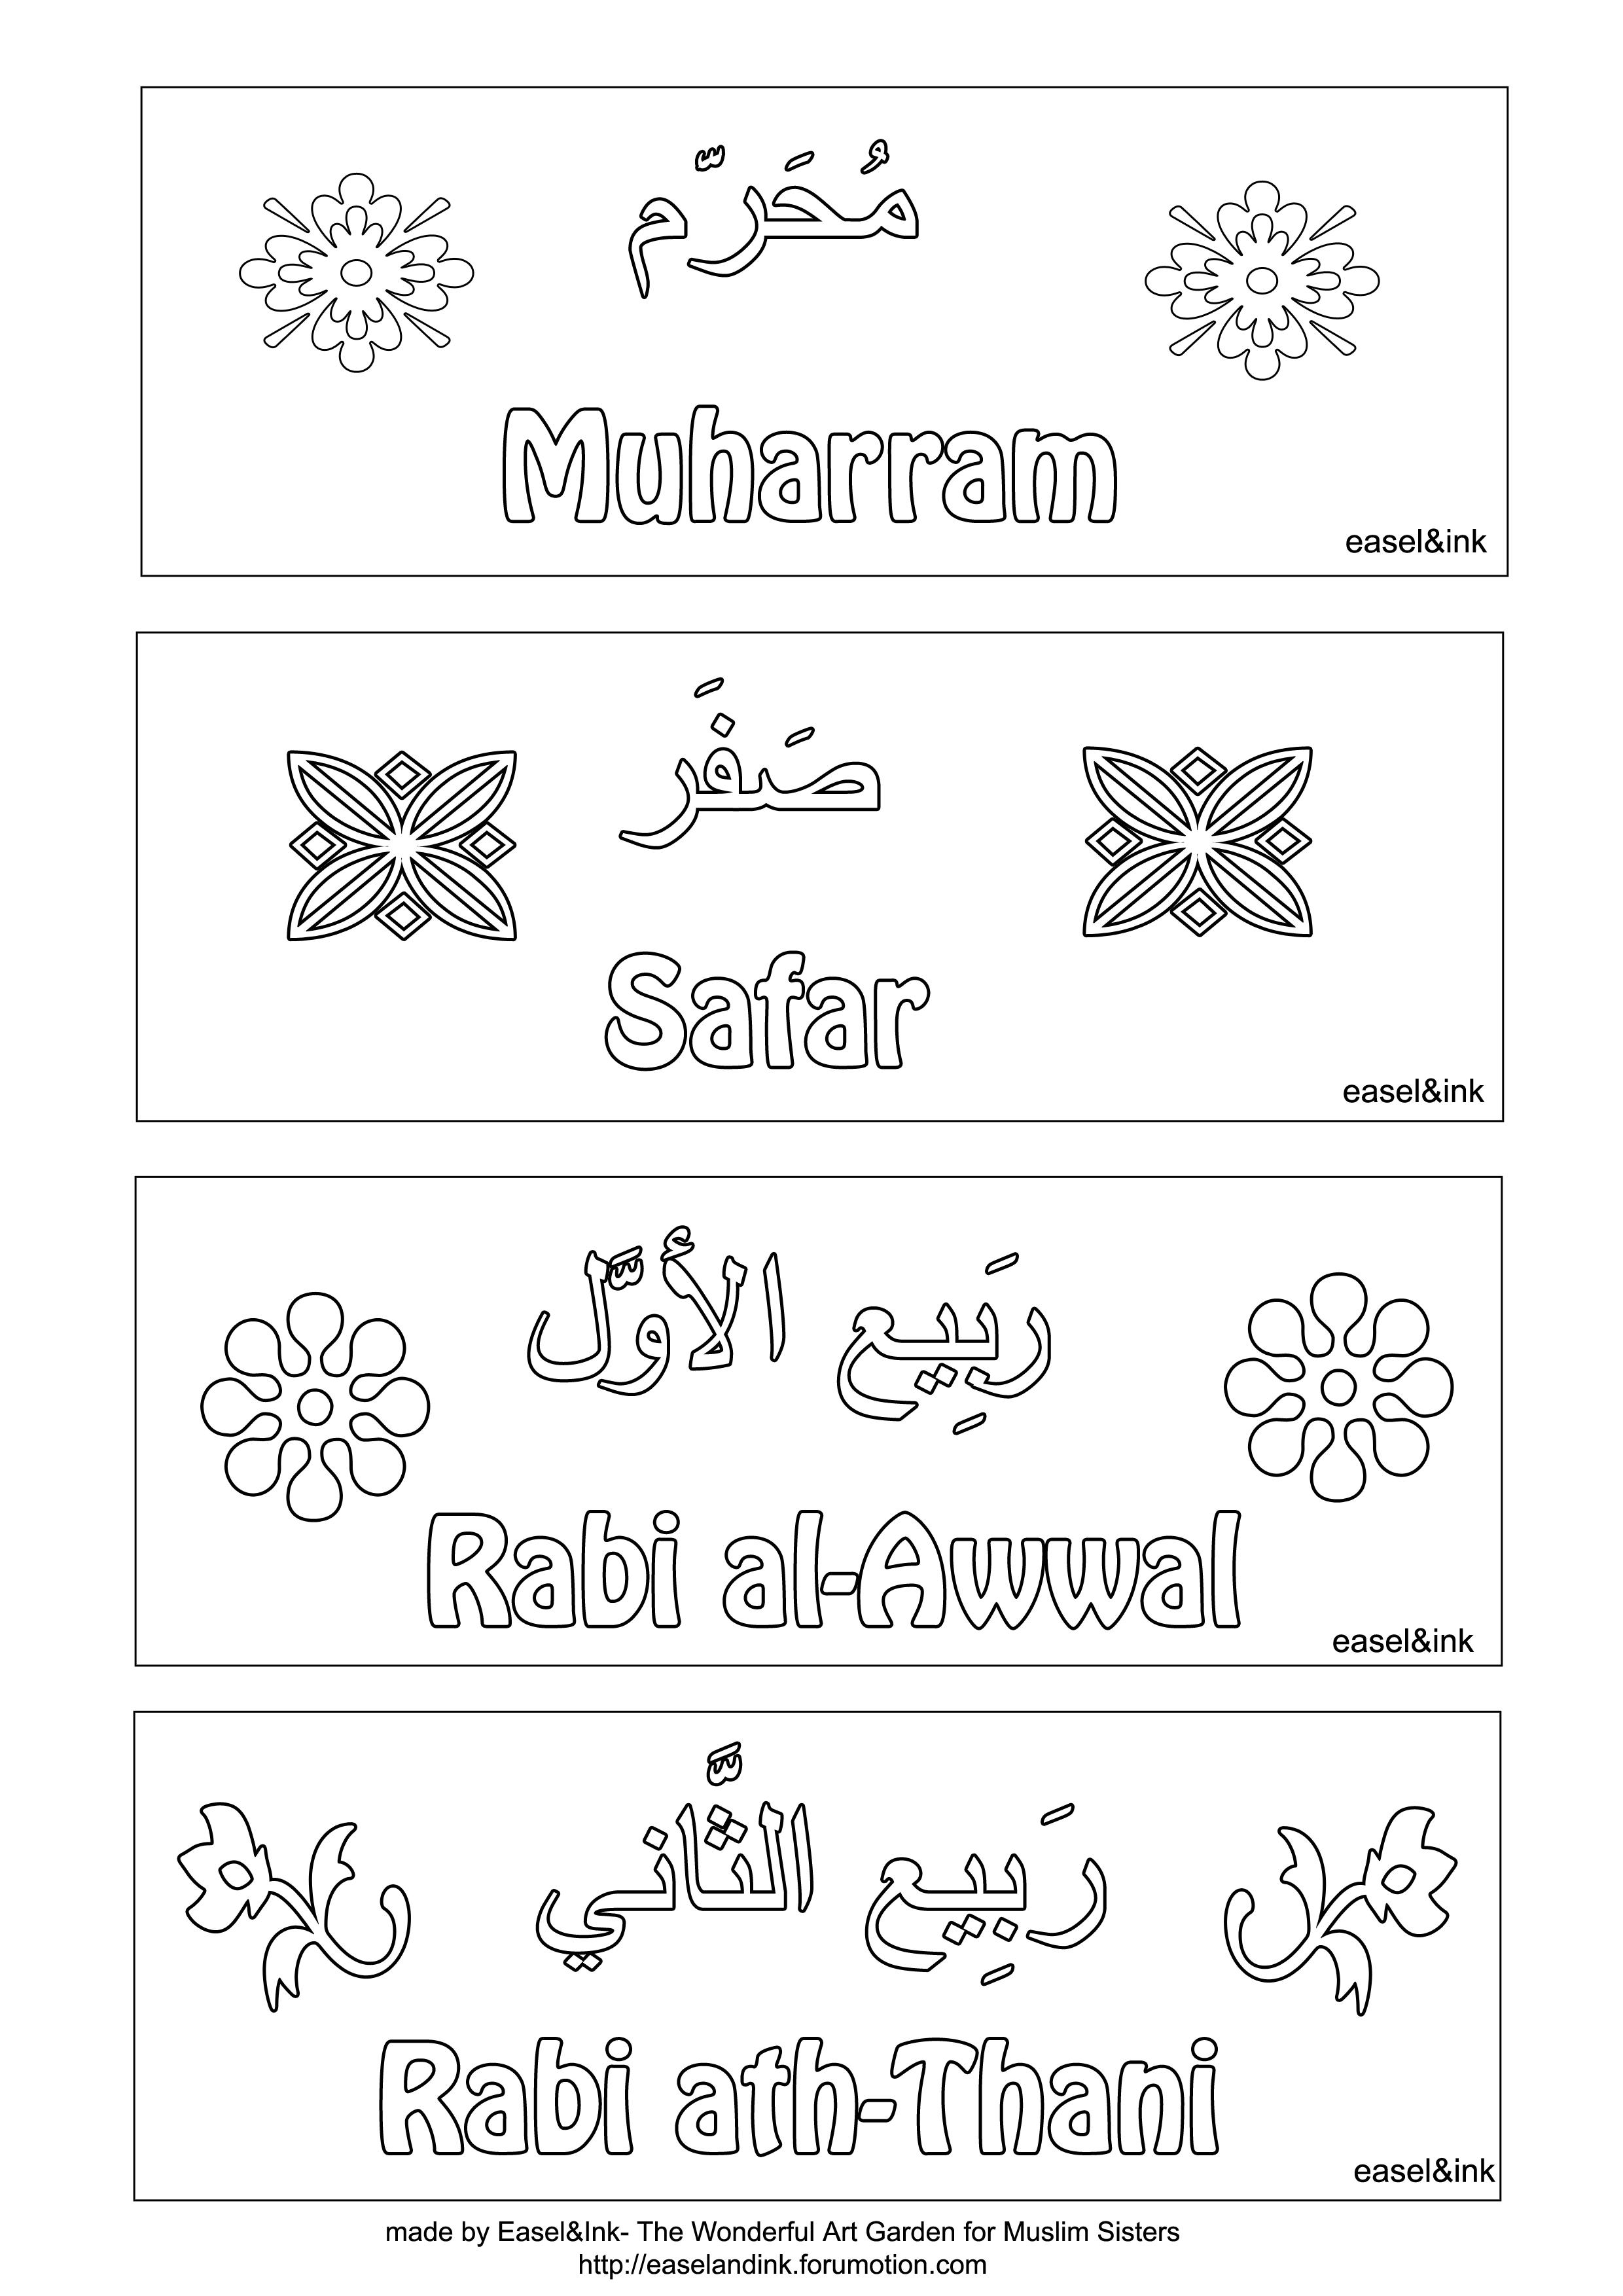 study | translate English to Arabic: Cambridge Dictionary